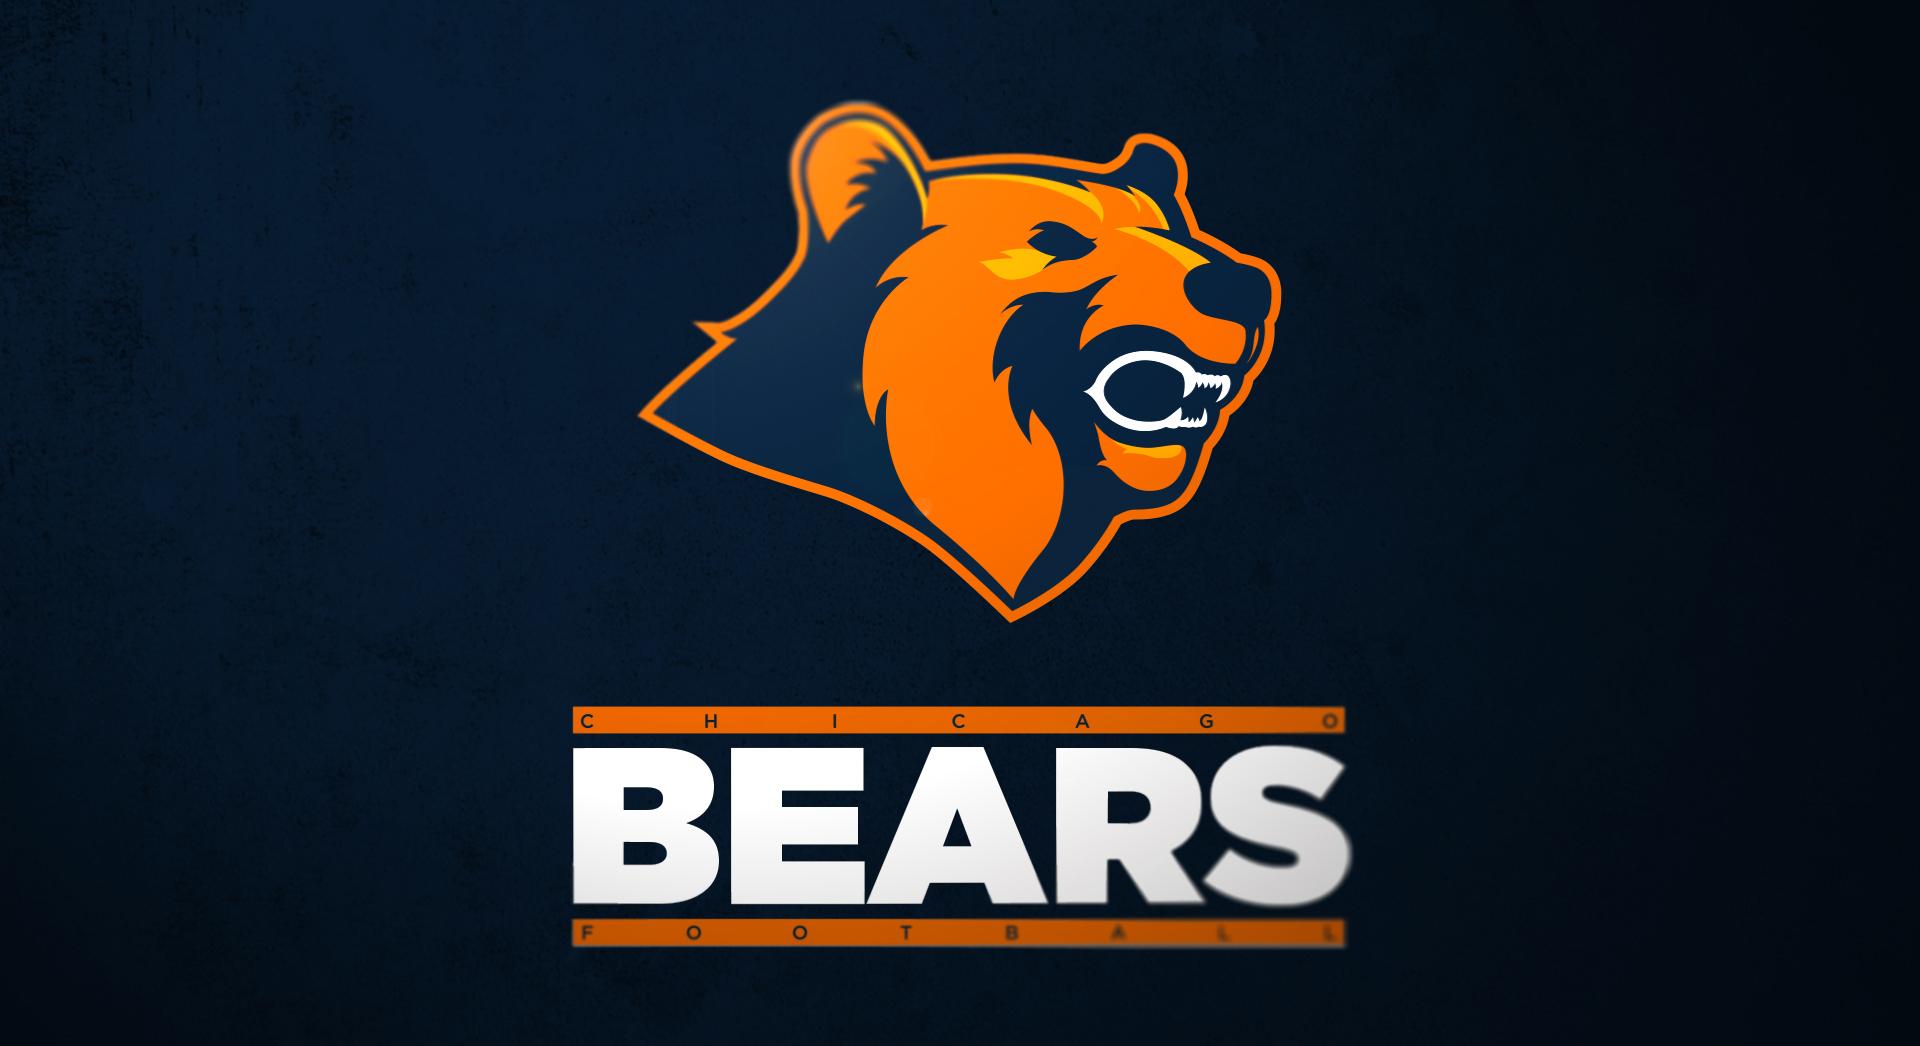 HD Chicago Bears Wallpaper 1920x1046